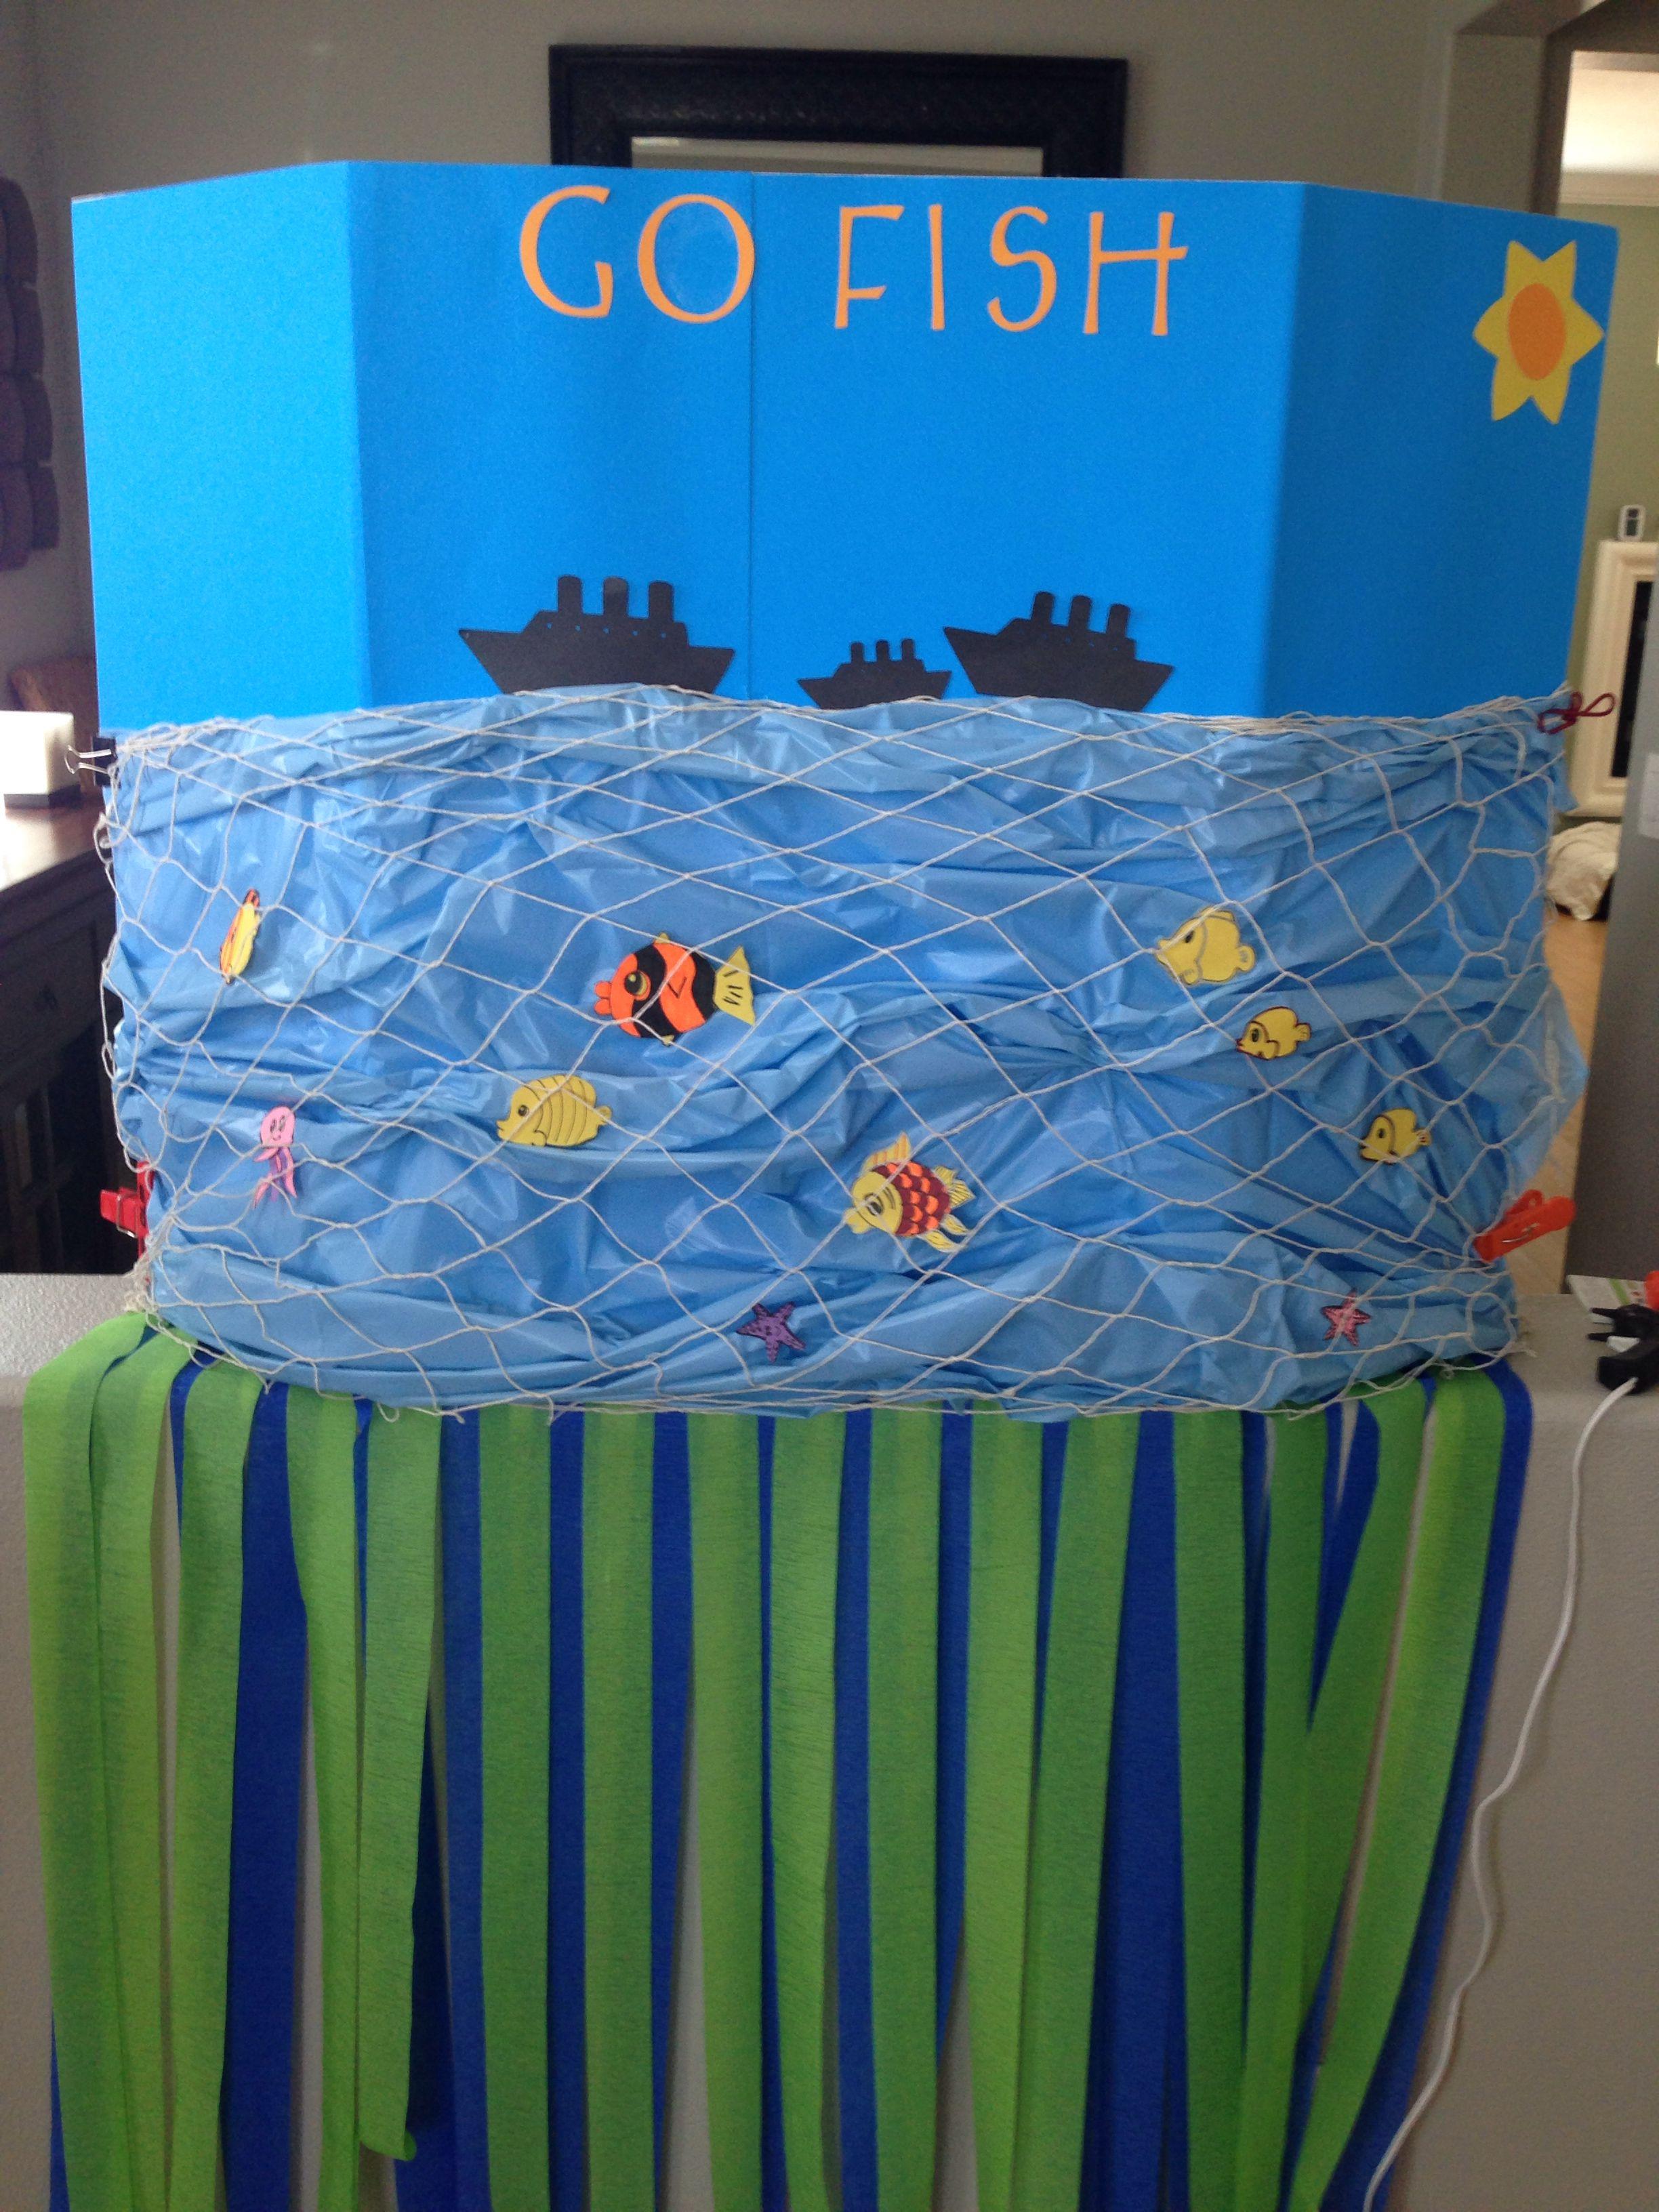 Go Fish a fun homemade carnival game! Homemade